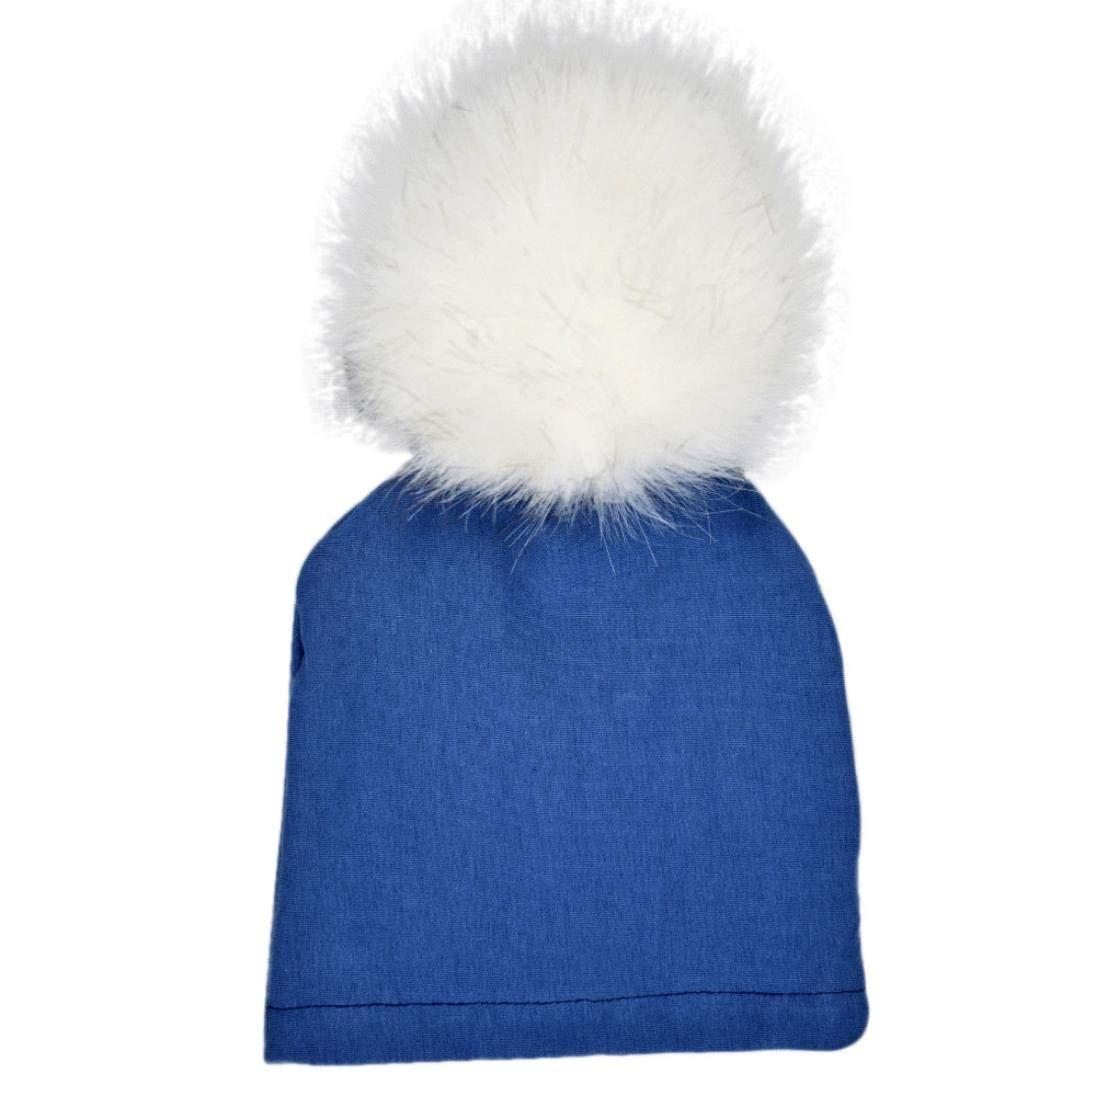 Blue Jinjiu Newborn Infant Baby Winter Warm Solid Hats Faux Fur Big Pompom Ball Cotton Beanie Cap For 0-12 Month Baby